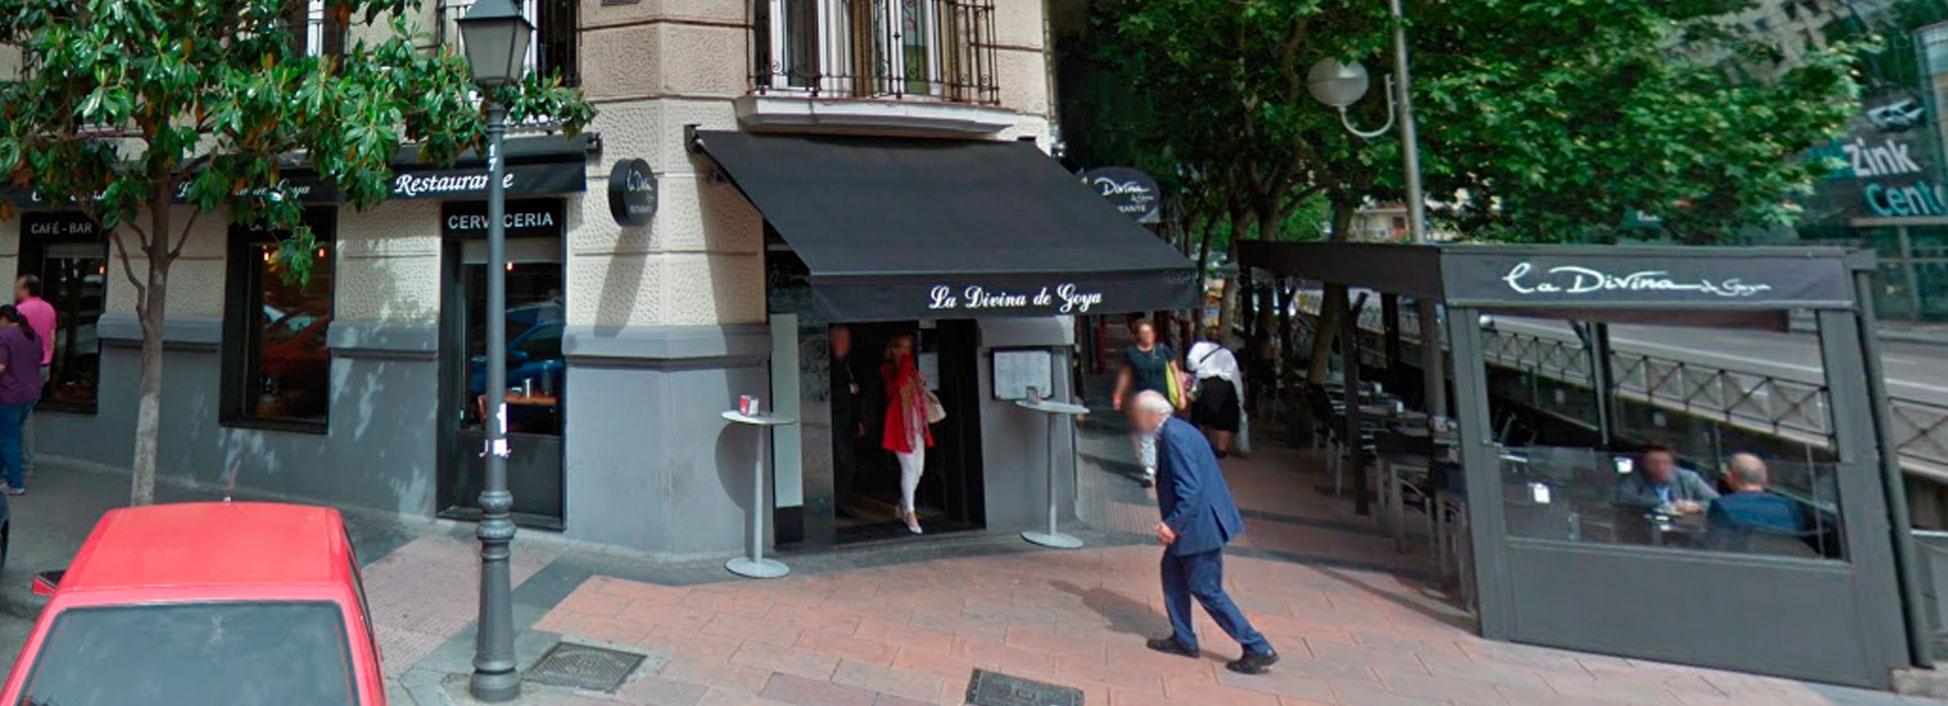 Restaurante La Divina De Goya